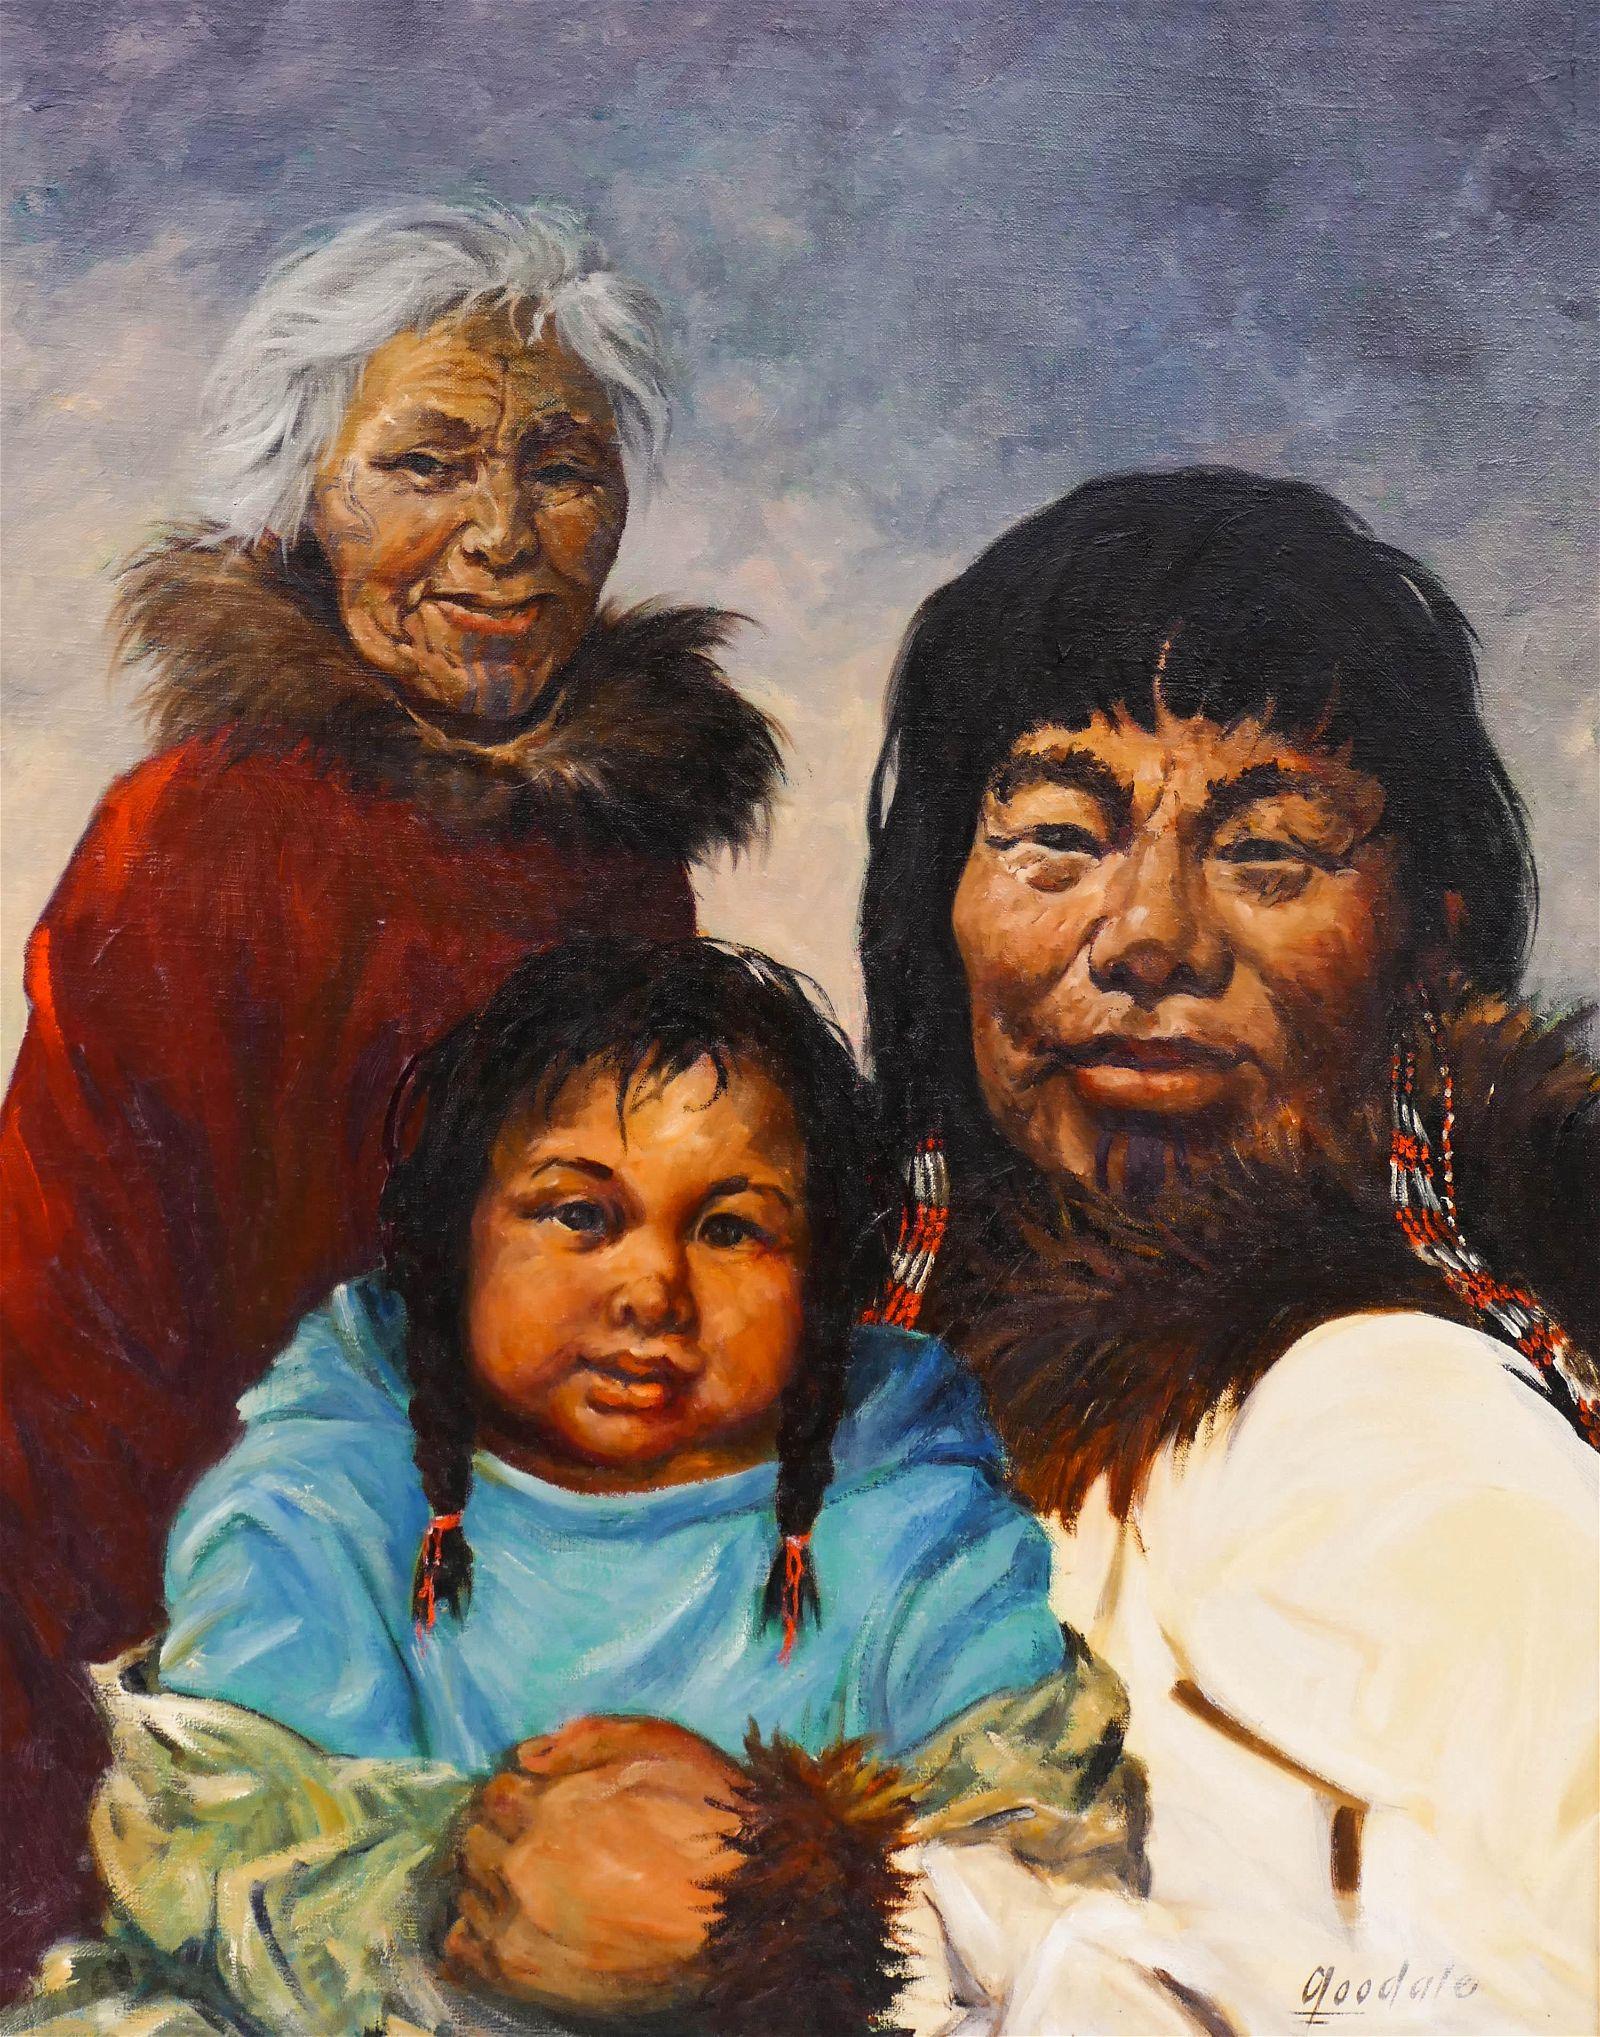 Harvey Goodale (1900-1980 Alaska) Eskimo Family Oil on